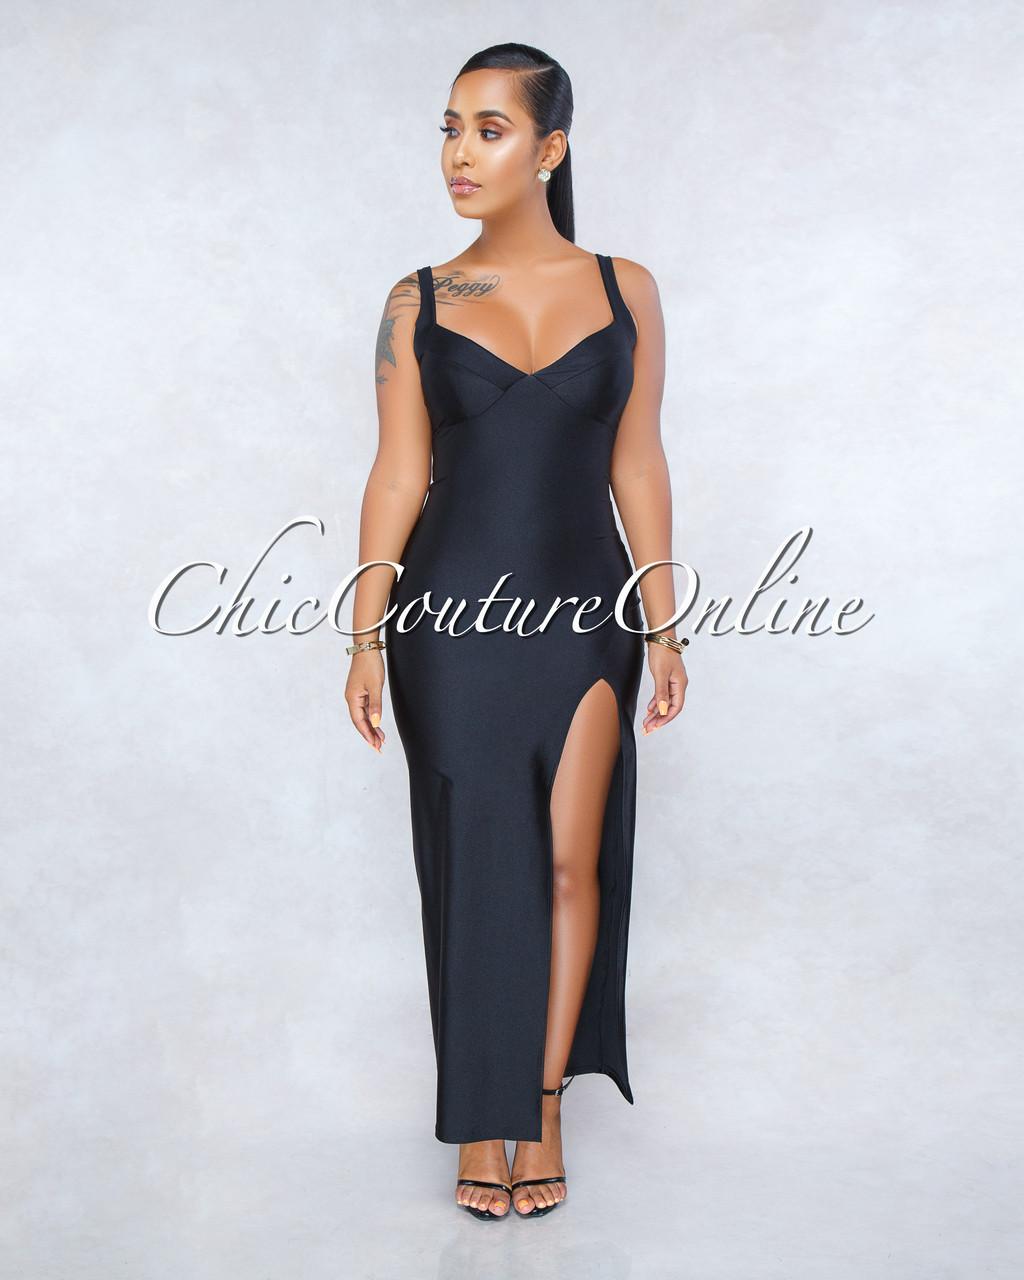 21391e522b724 Breena Black Satin Front Slit Padded Maxi Dress. Price: $50.00. Image 1